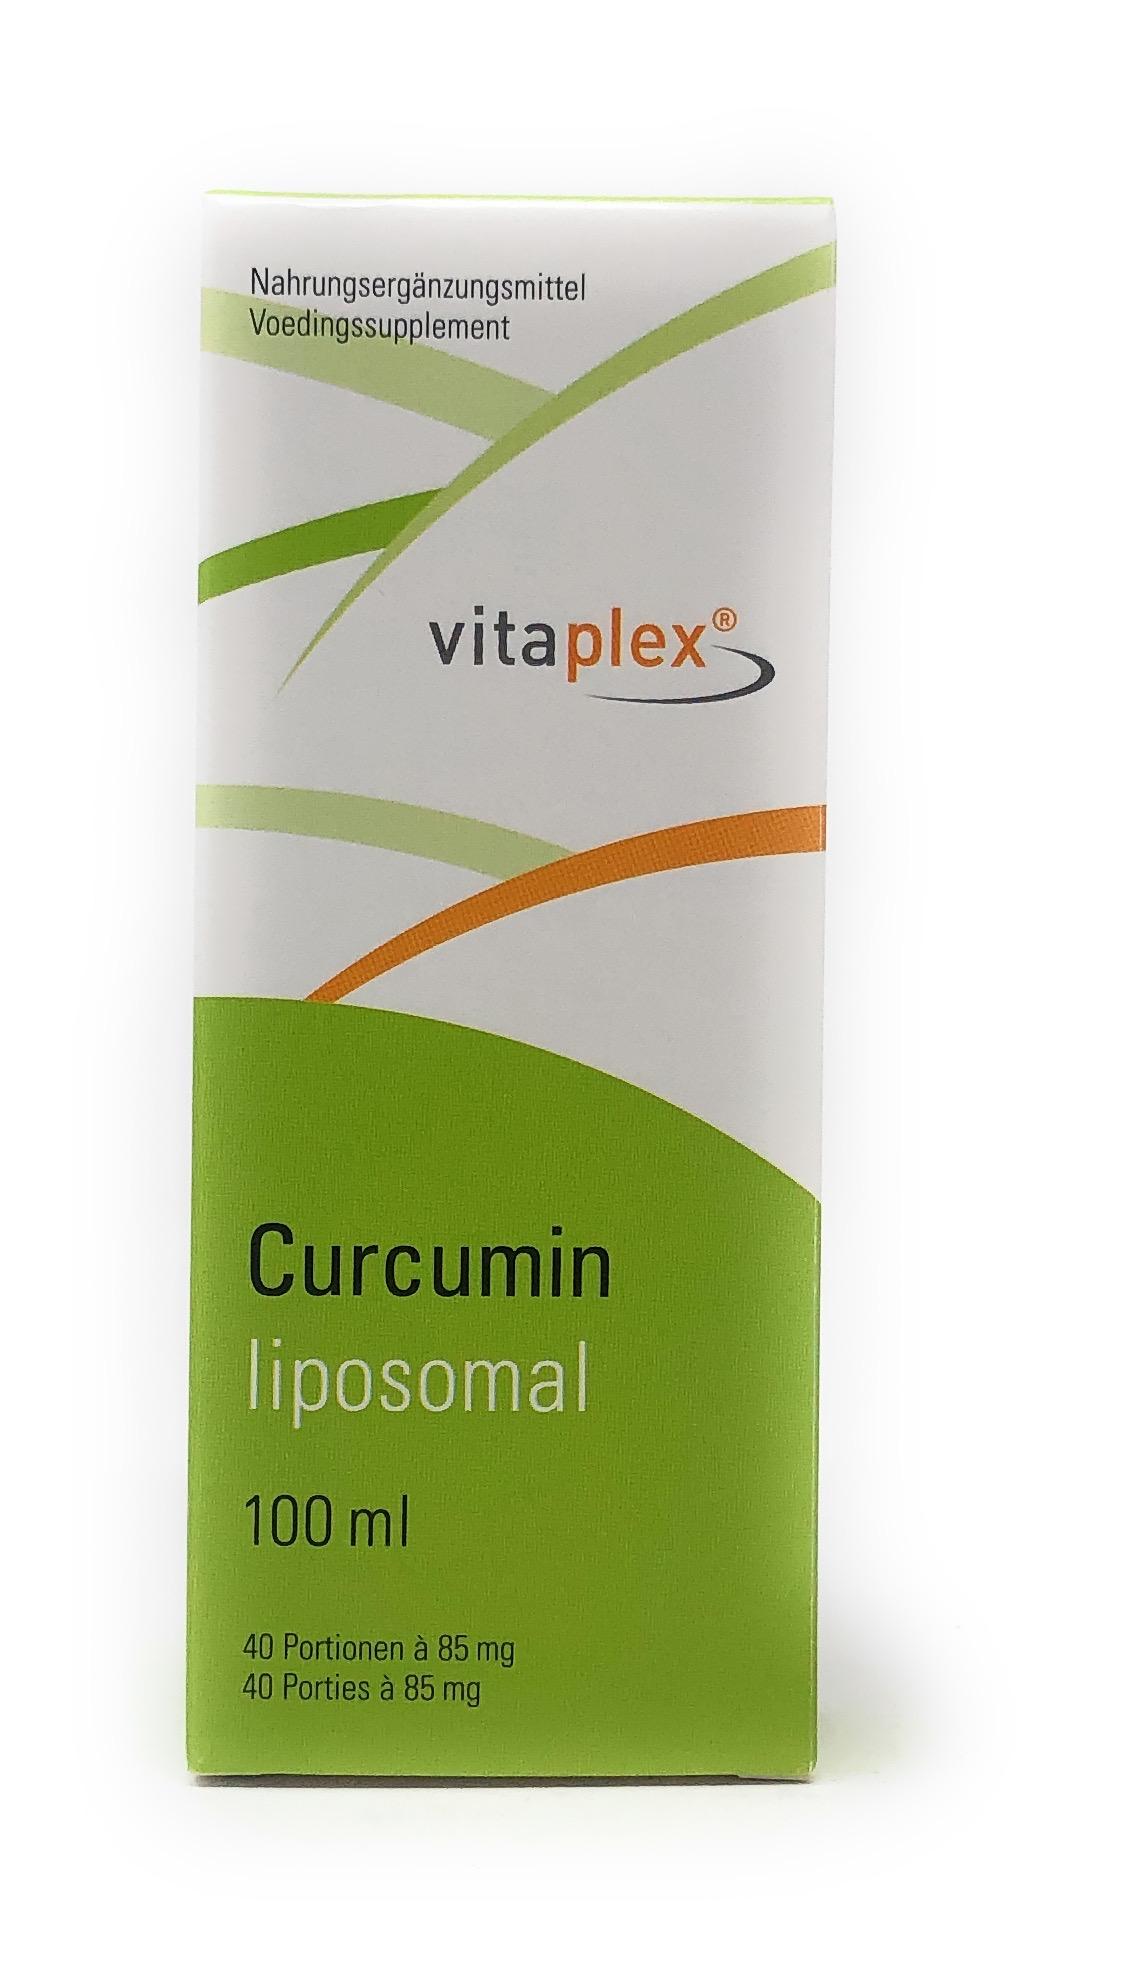 Vitaplex Curcumin C3 Complex liposomal  100ml (40 Portionen à 85mg)